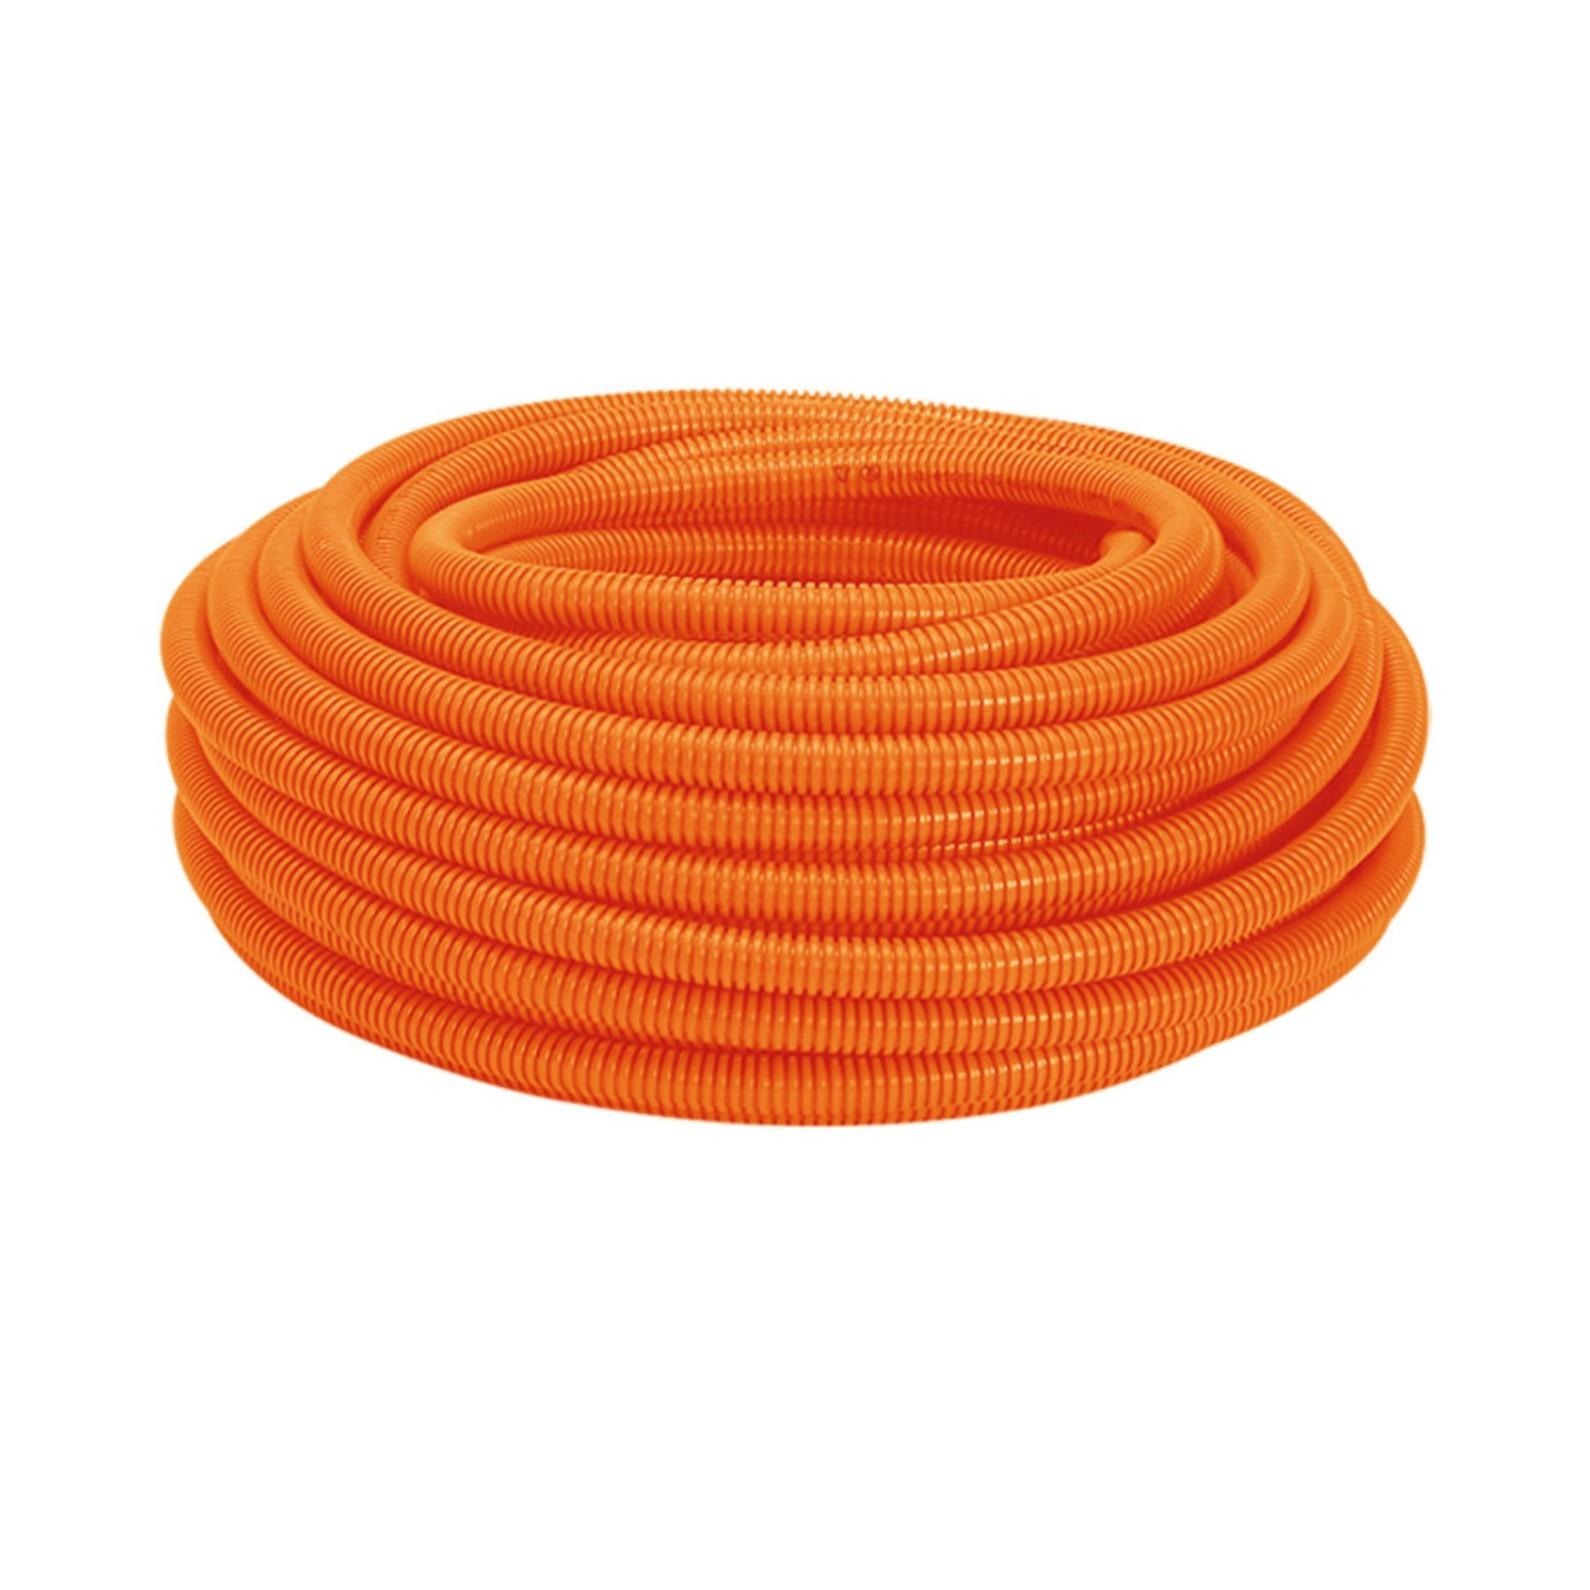 Eletroduto Flexivel Corrugado PVC DN 25 mm x 50m Laranja - Amanco